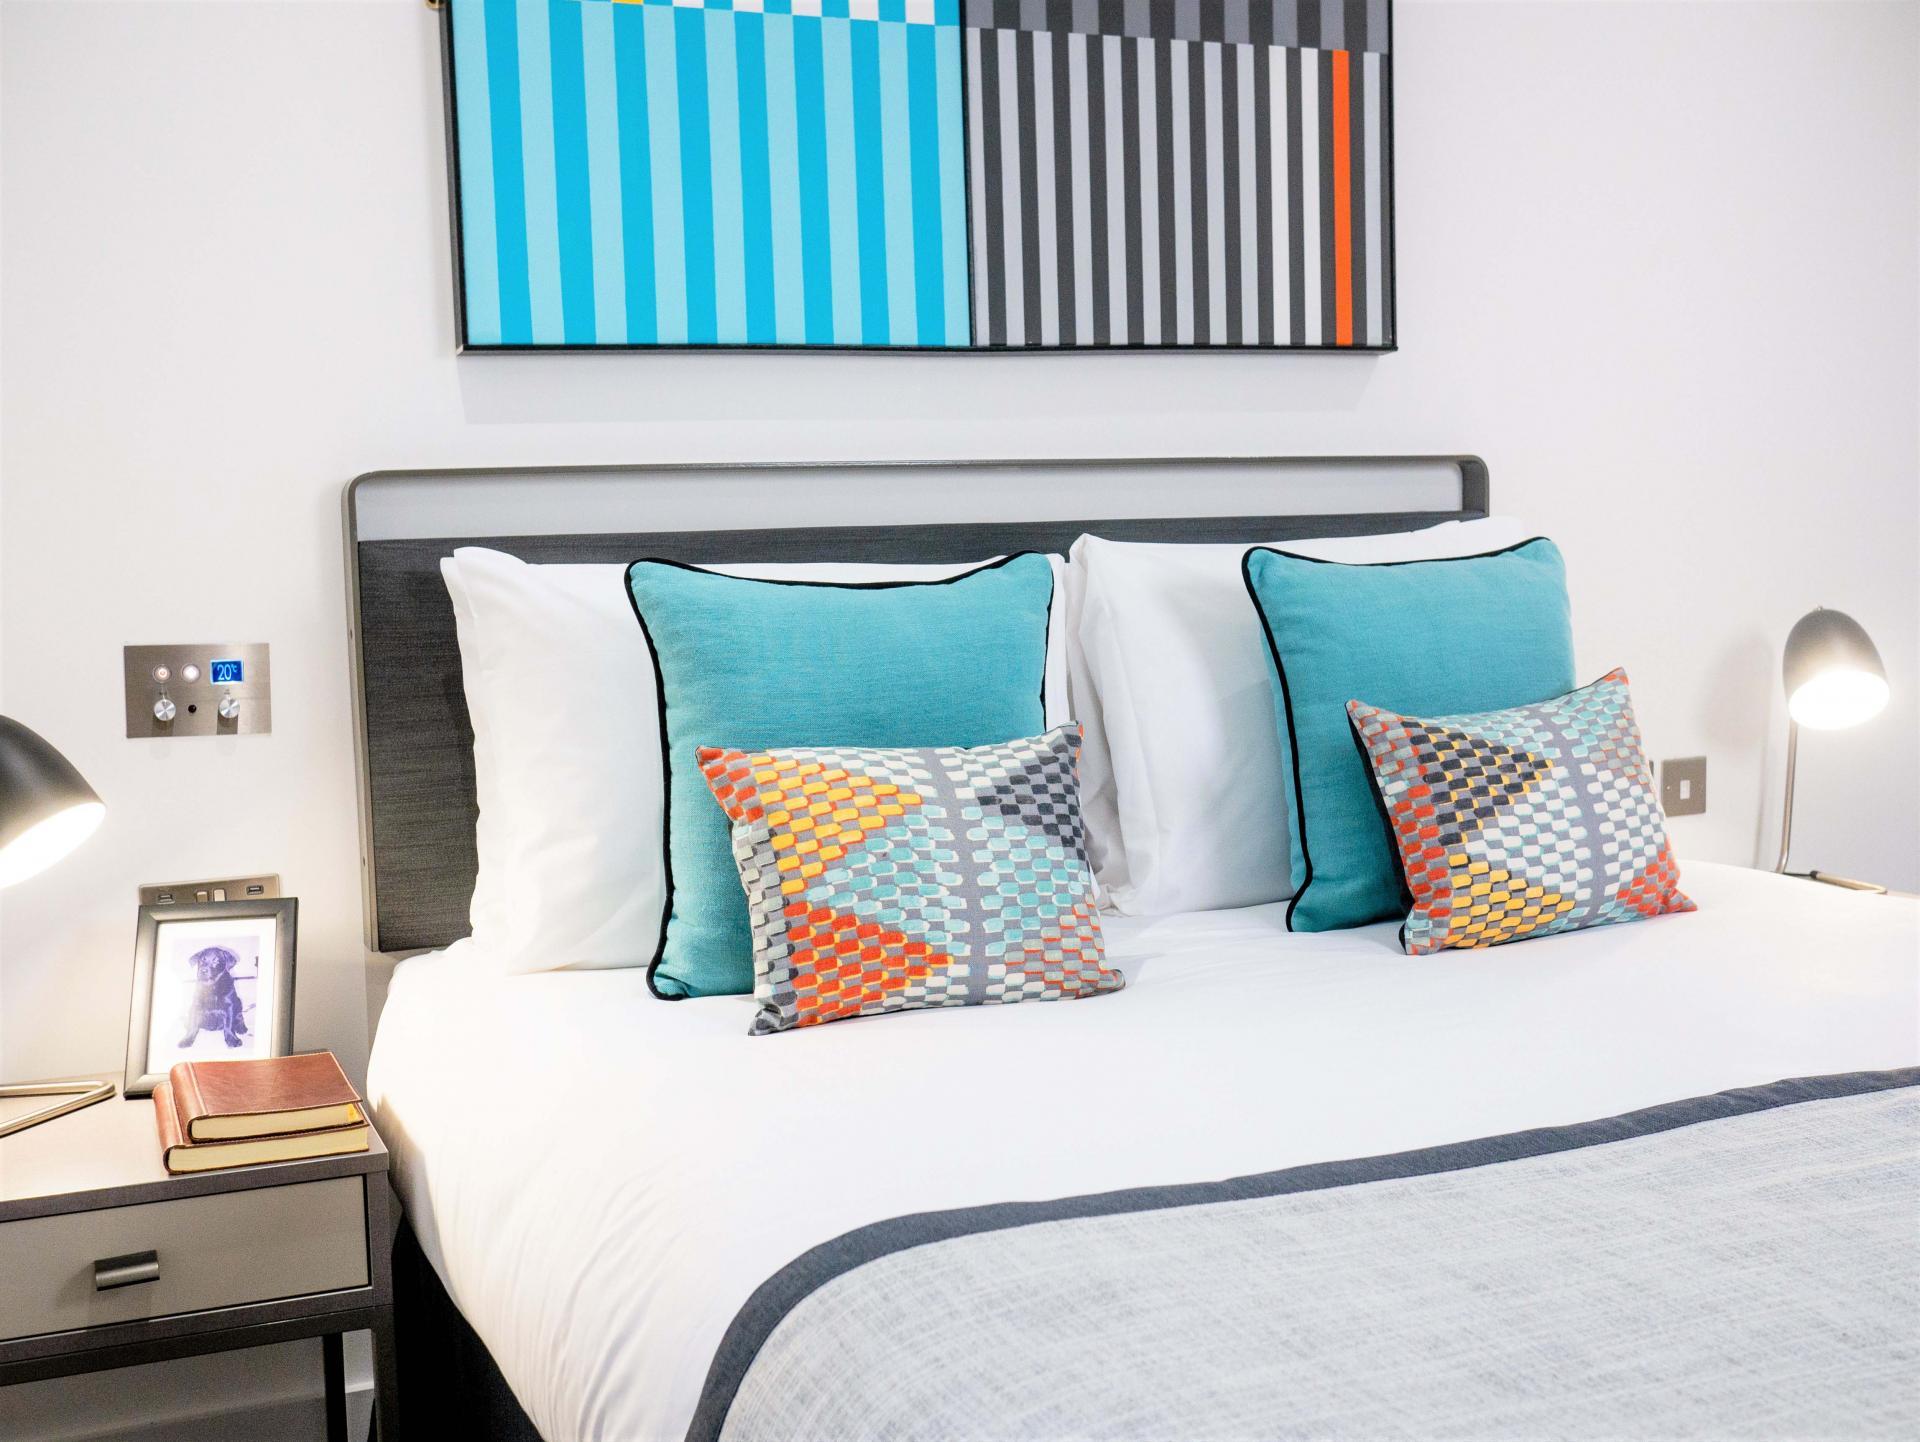 Bed at Q Square Aparthotel, Centre, Brighton - Citybase Apartments